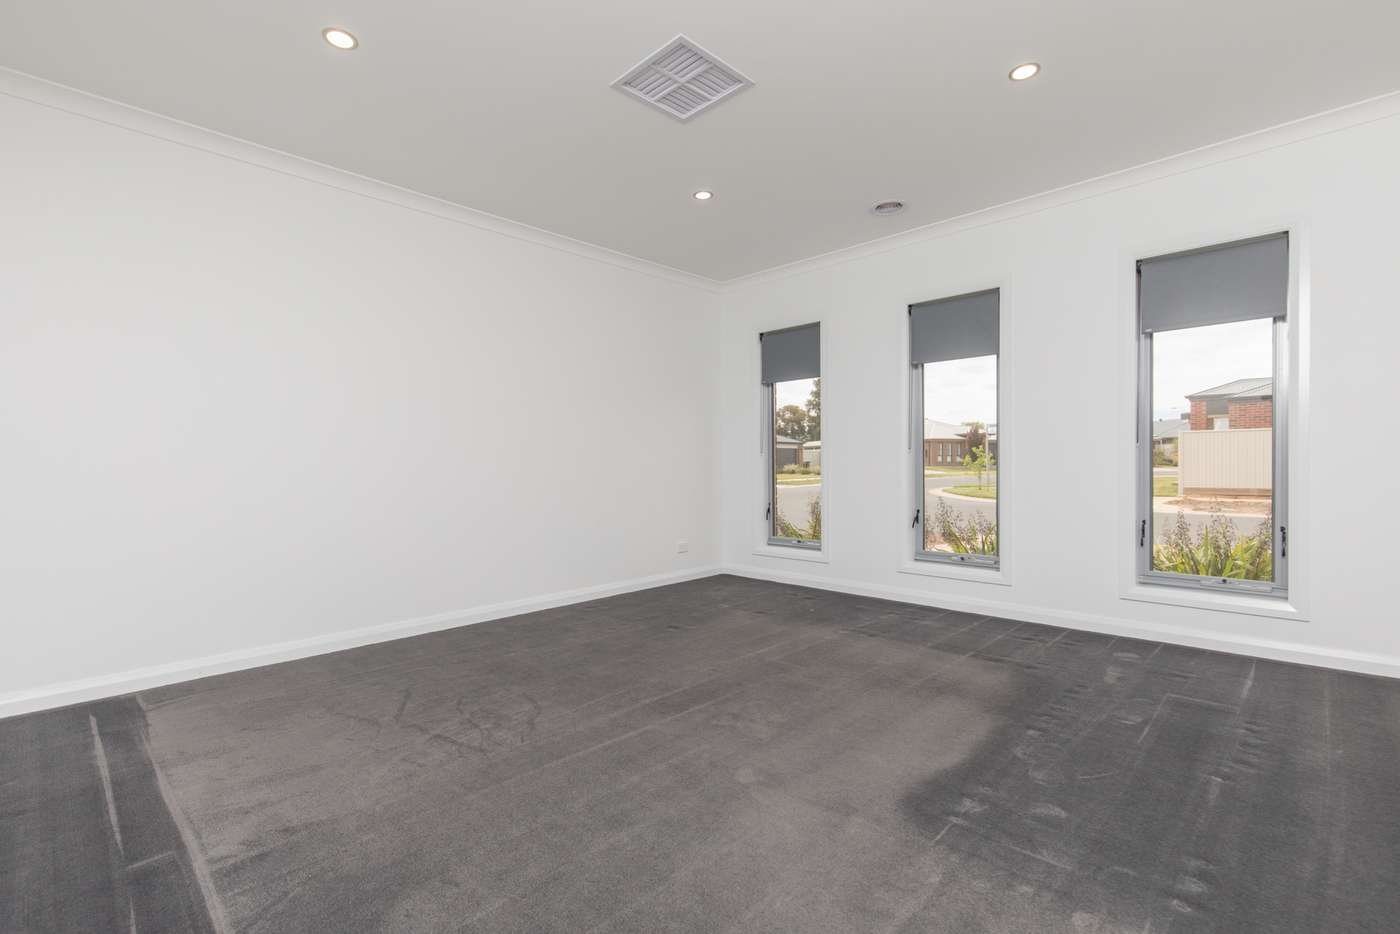 Sixth view of Homely house listing, 2 Karalanza Drive, Mildura VIC 3500